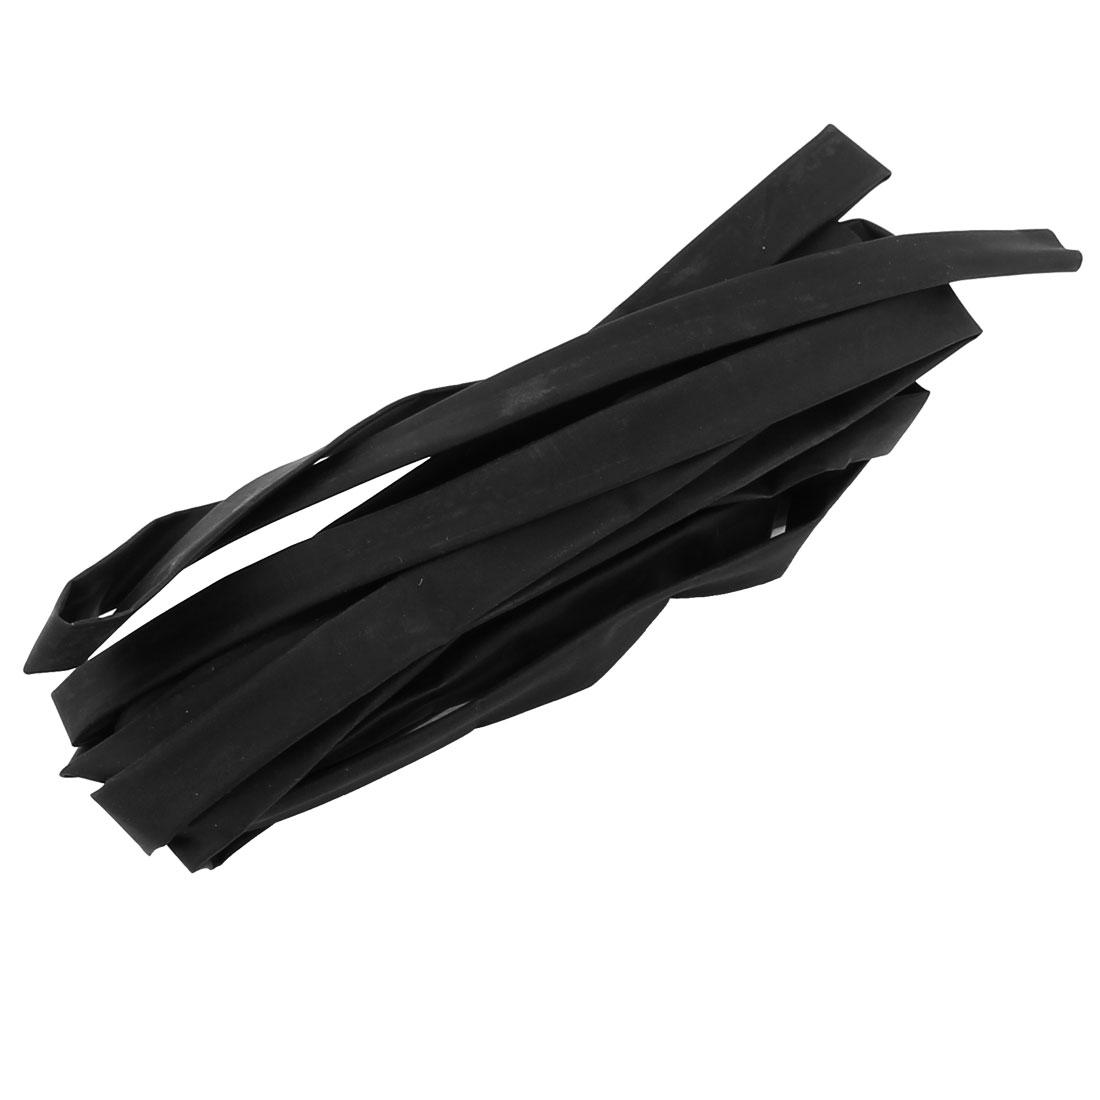 2.5M Length 6mm Dia Polyolefin Heat Shrinkable Tube Sleeving Black